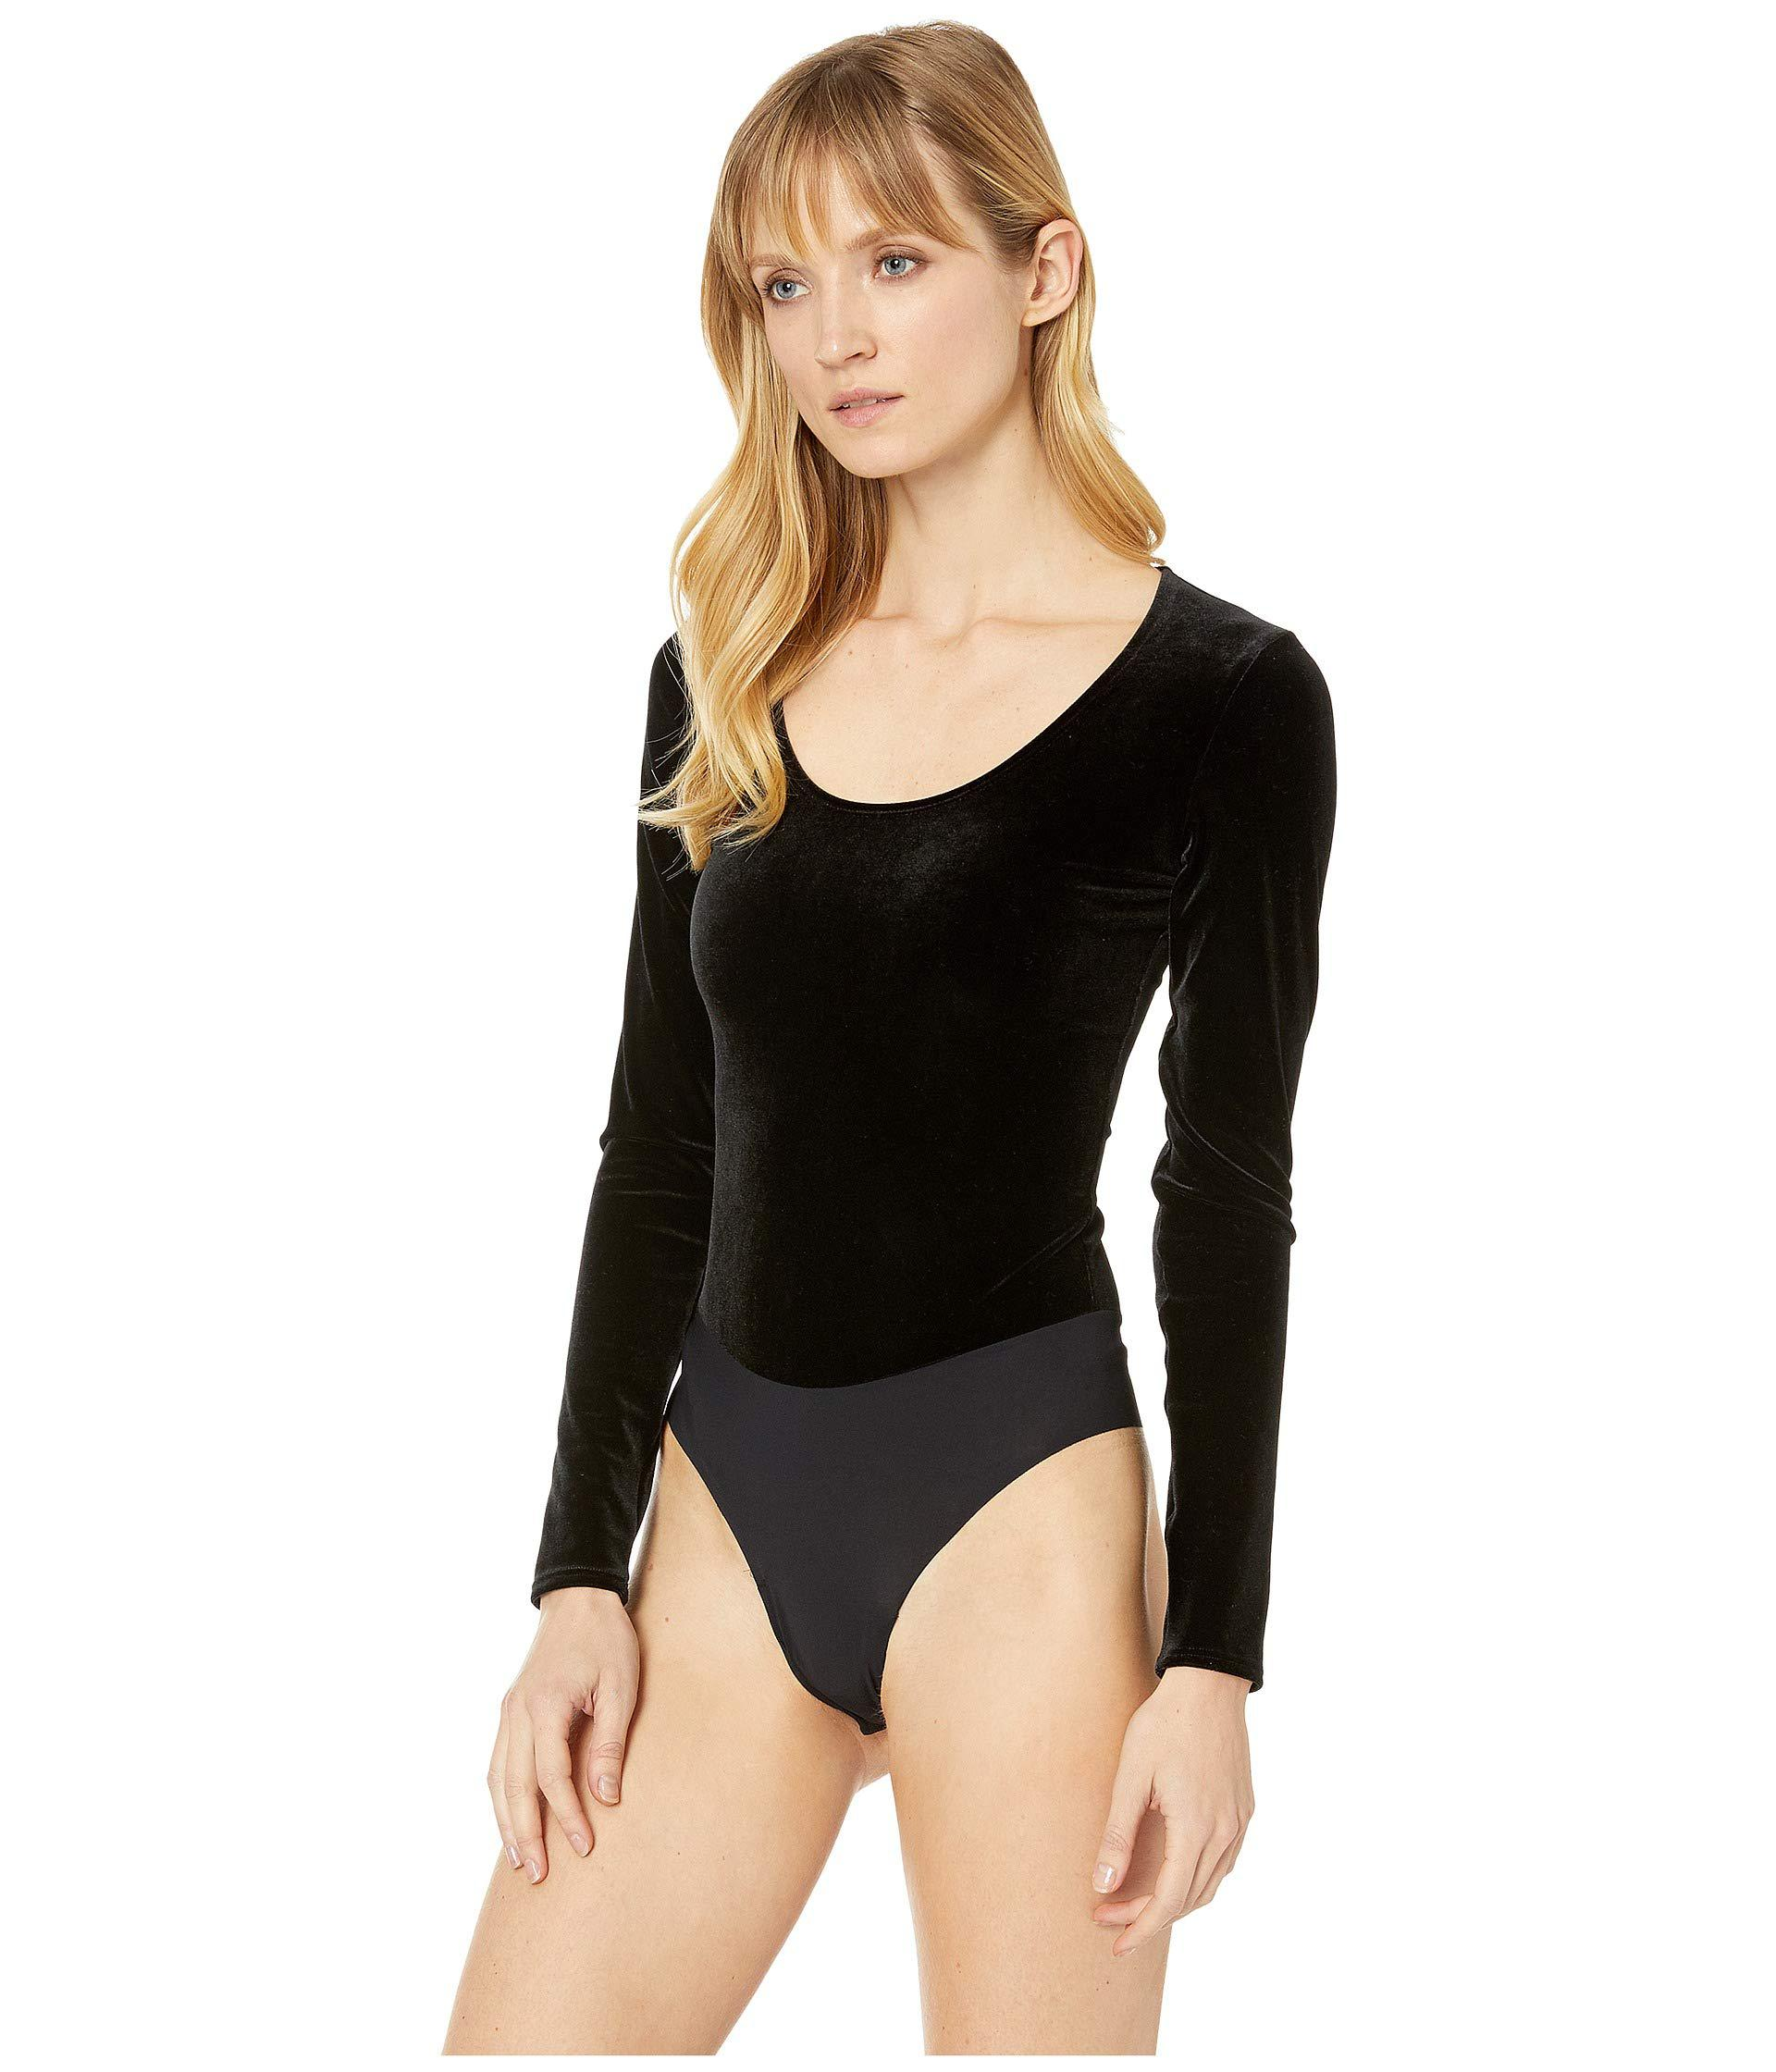 Lyst - Commando Velvet Long Sleeve Bodysuit Bds023 (black) Women s Jumpsuit    Rompers One Piece in Black 7b49d1564